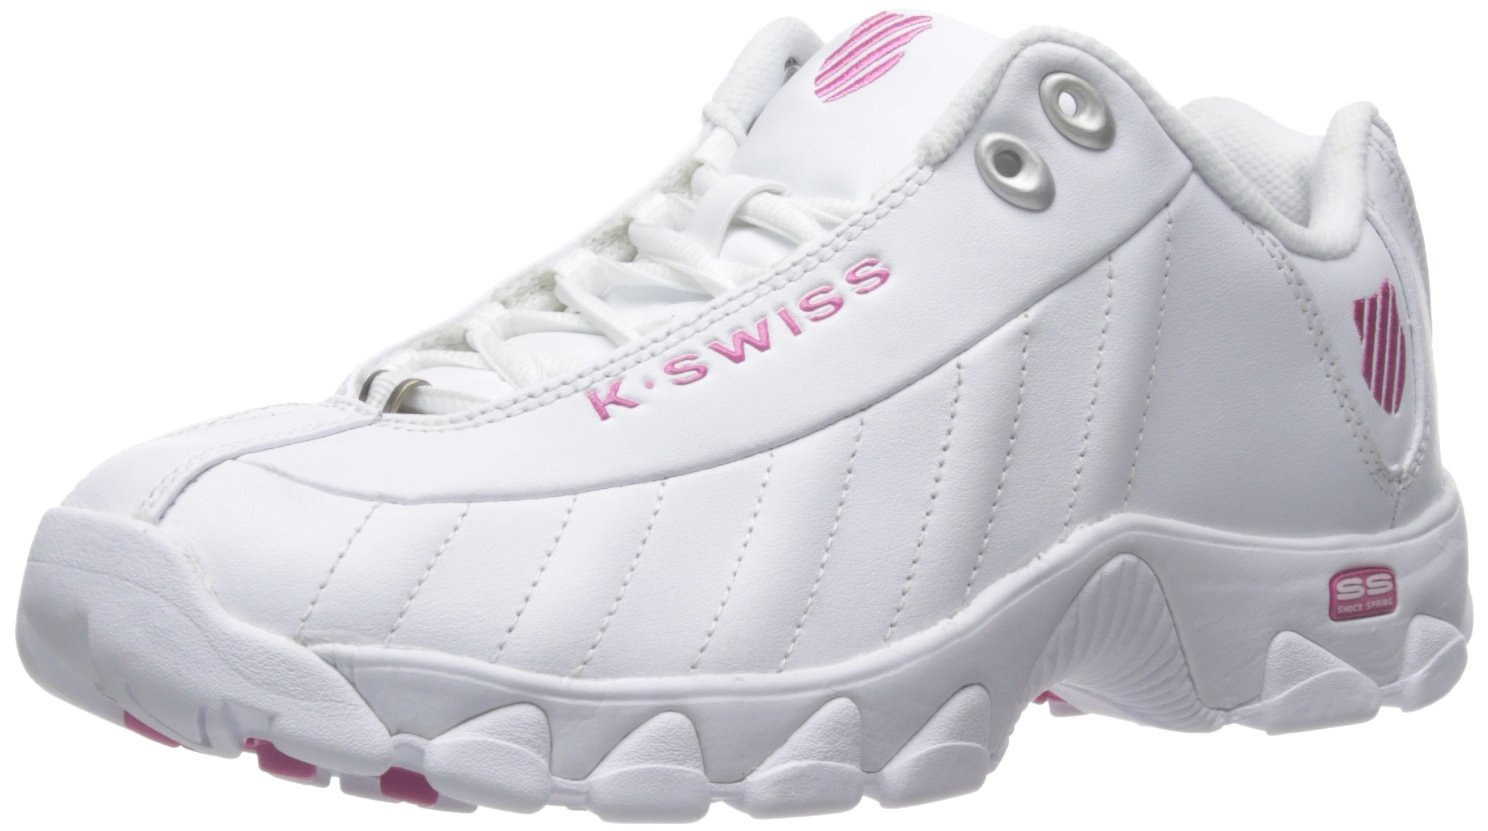 K-Swiss B00RBOLDXQ Women's ST329 CMF Training Shoe B00RBOLDXQ K-Swiss 7.5 B(M) US|White/Shocking Pink abd556